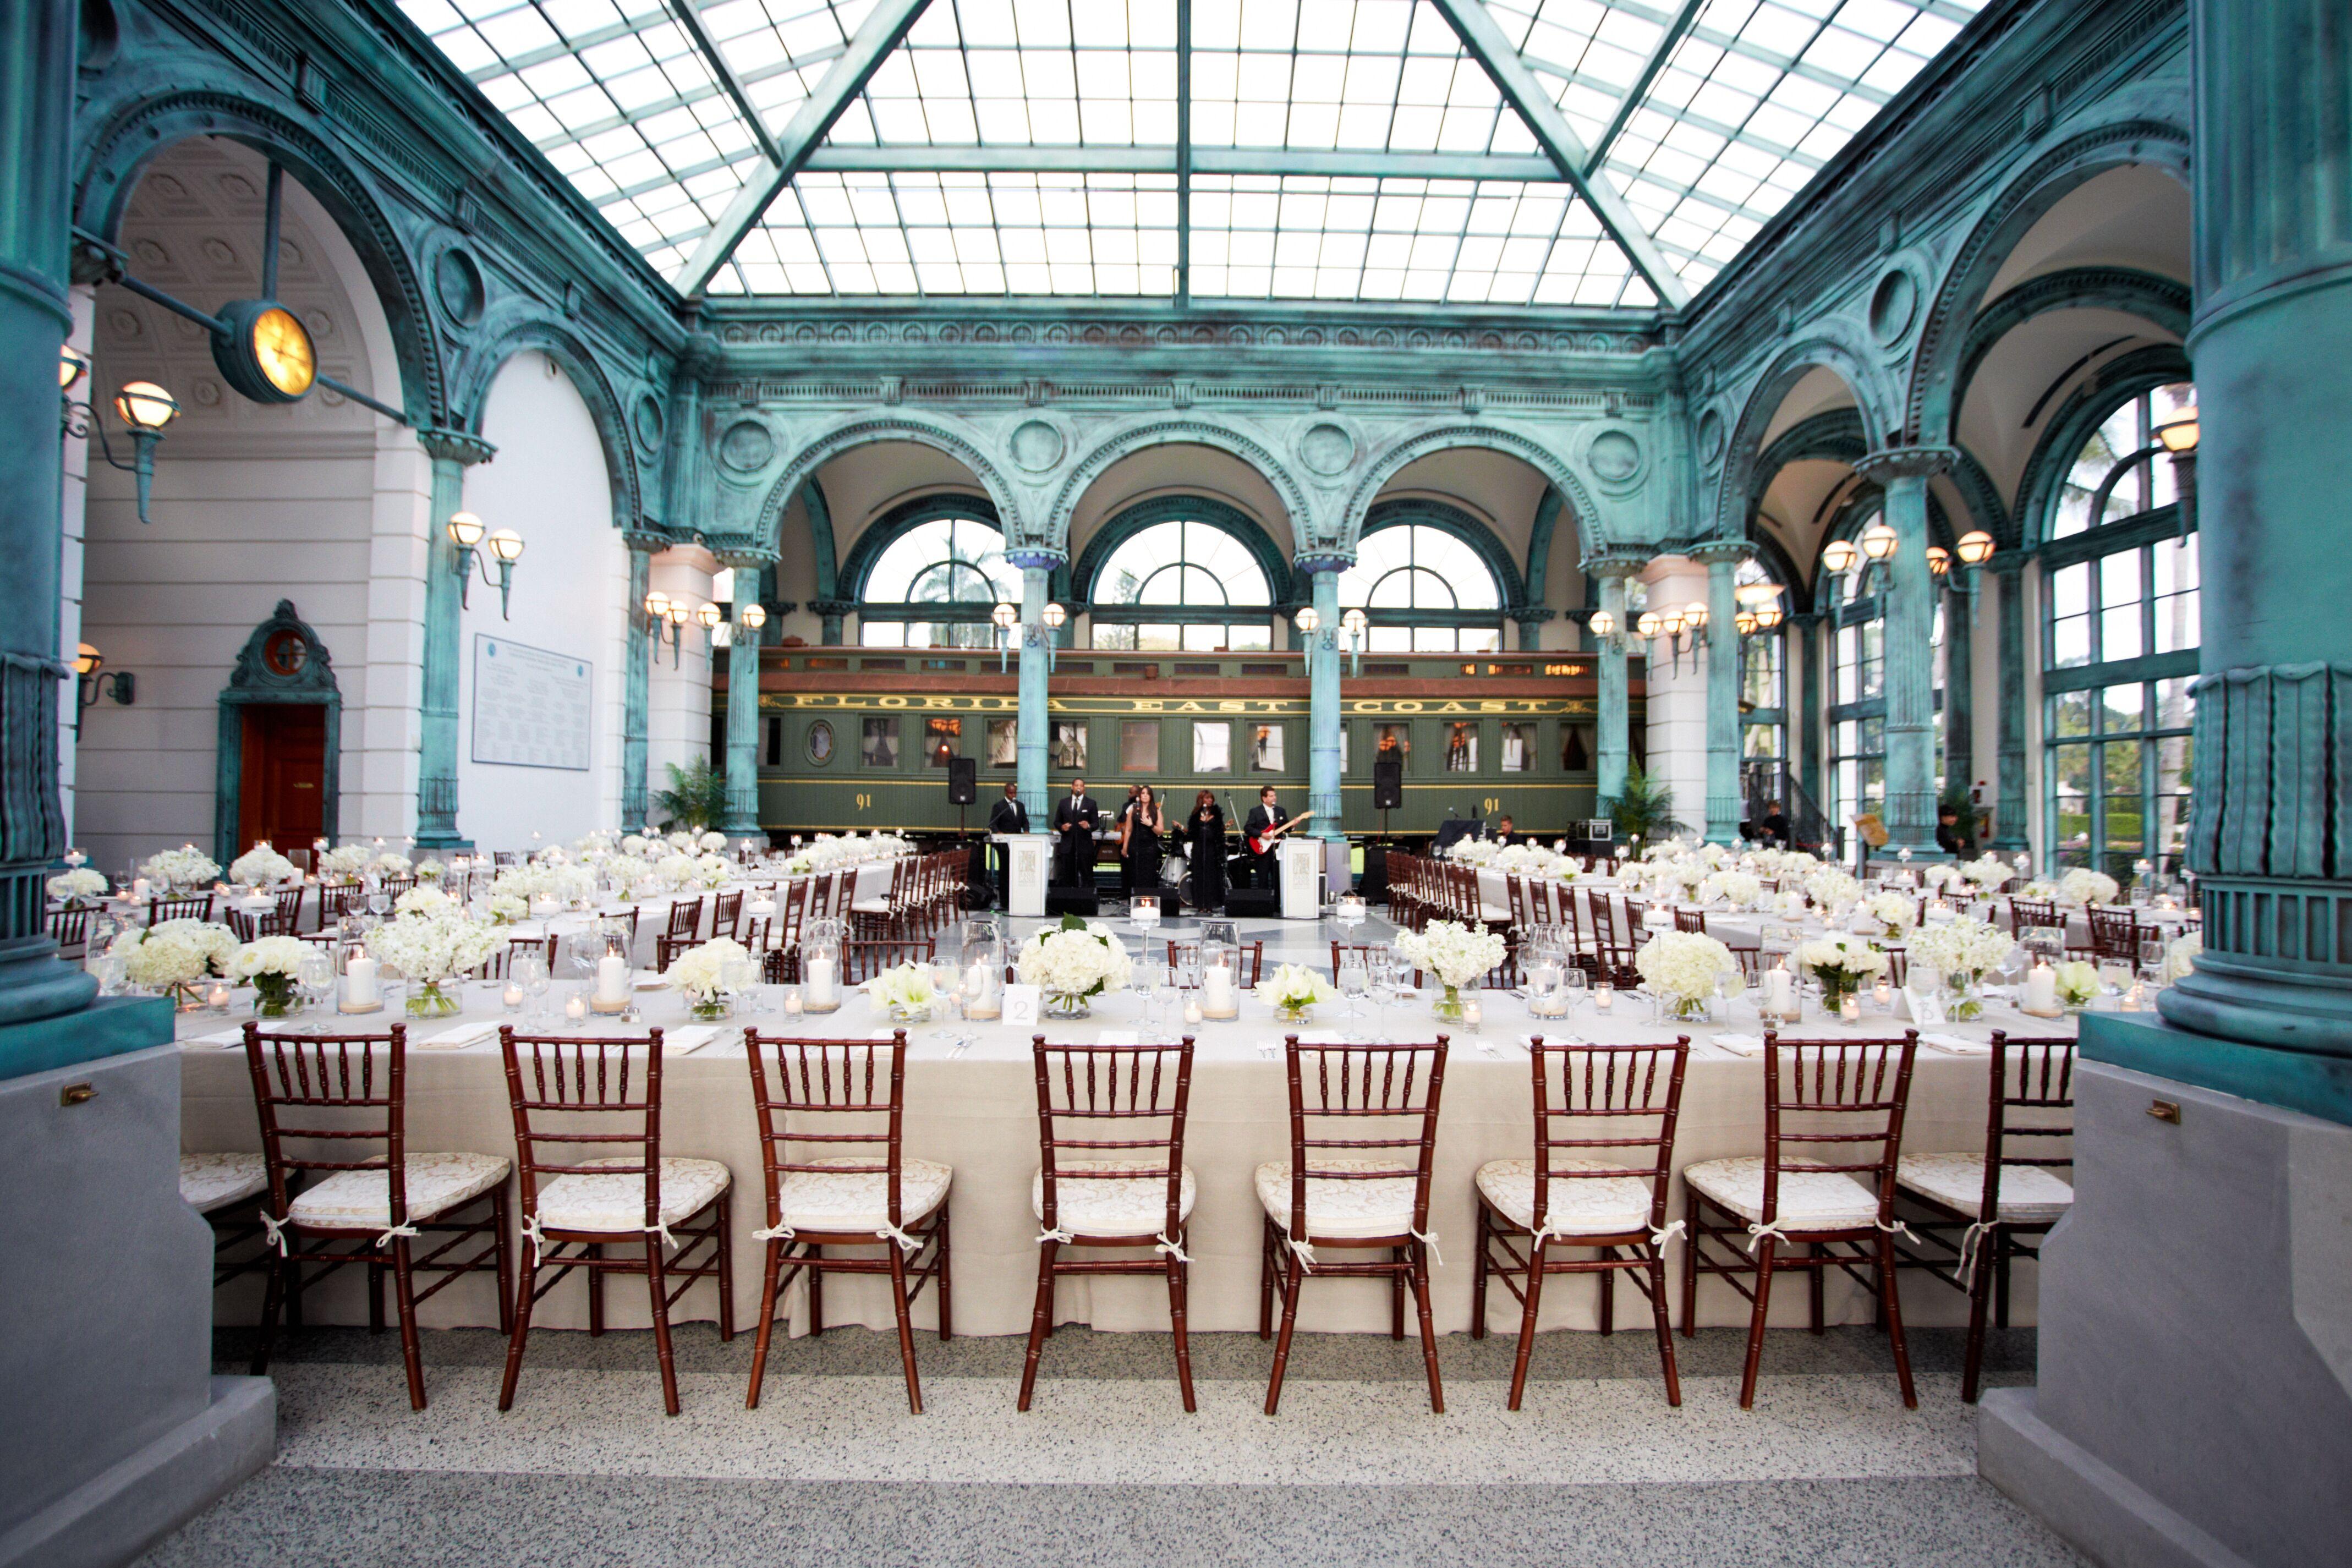 Wedding Timeline And Checklist